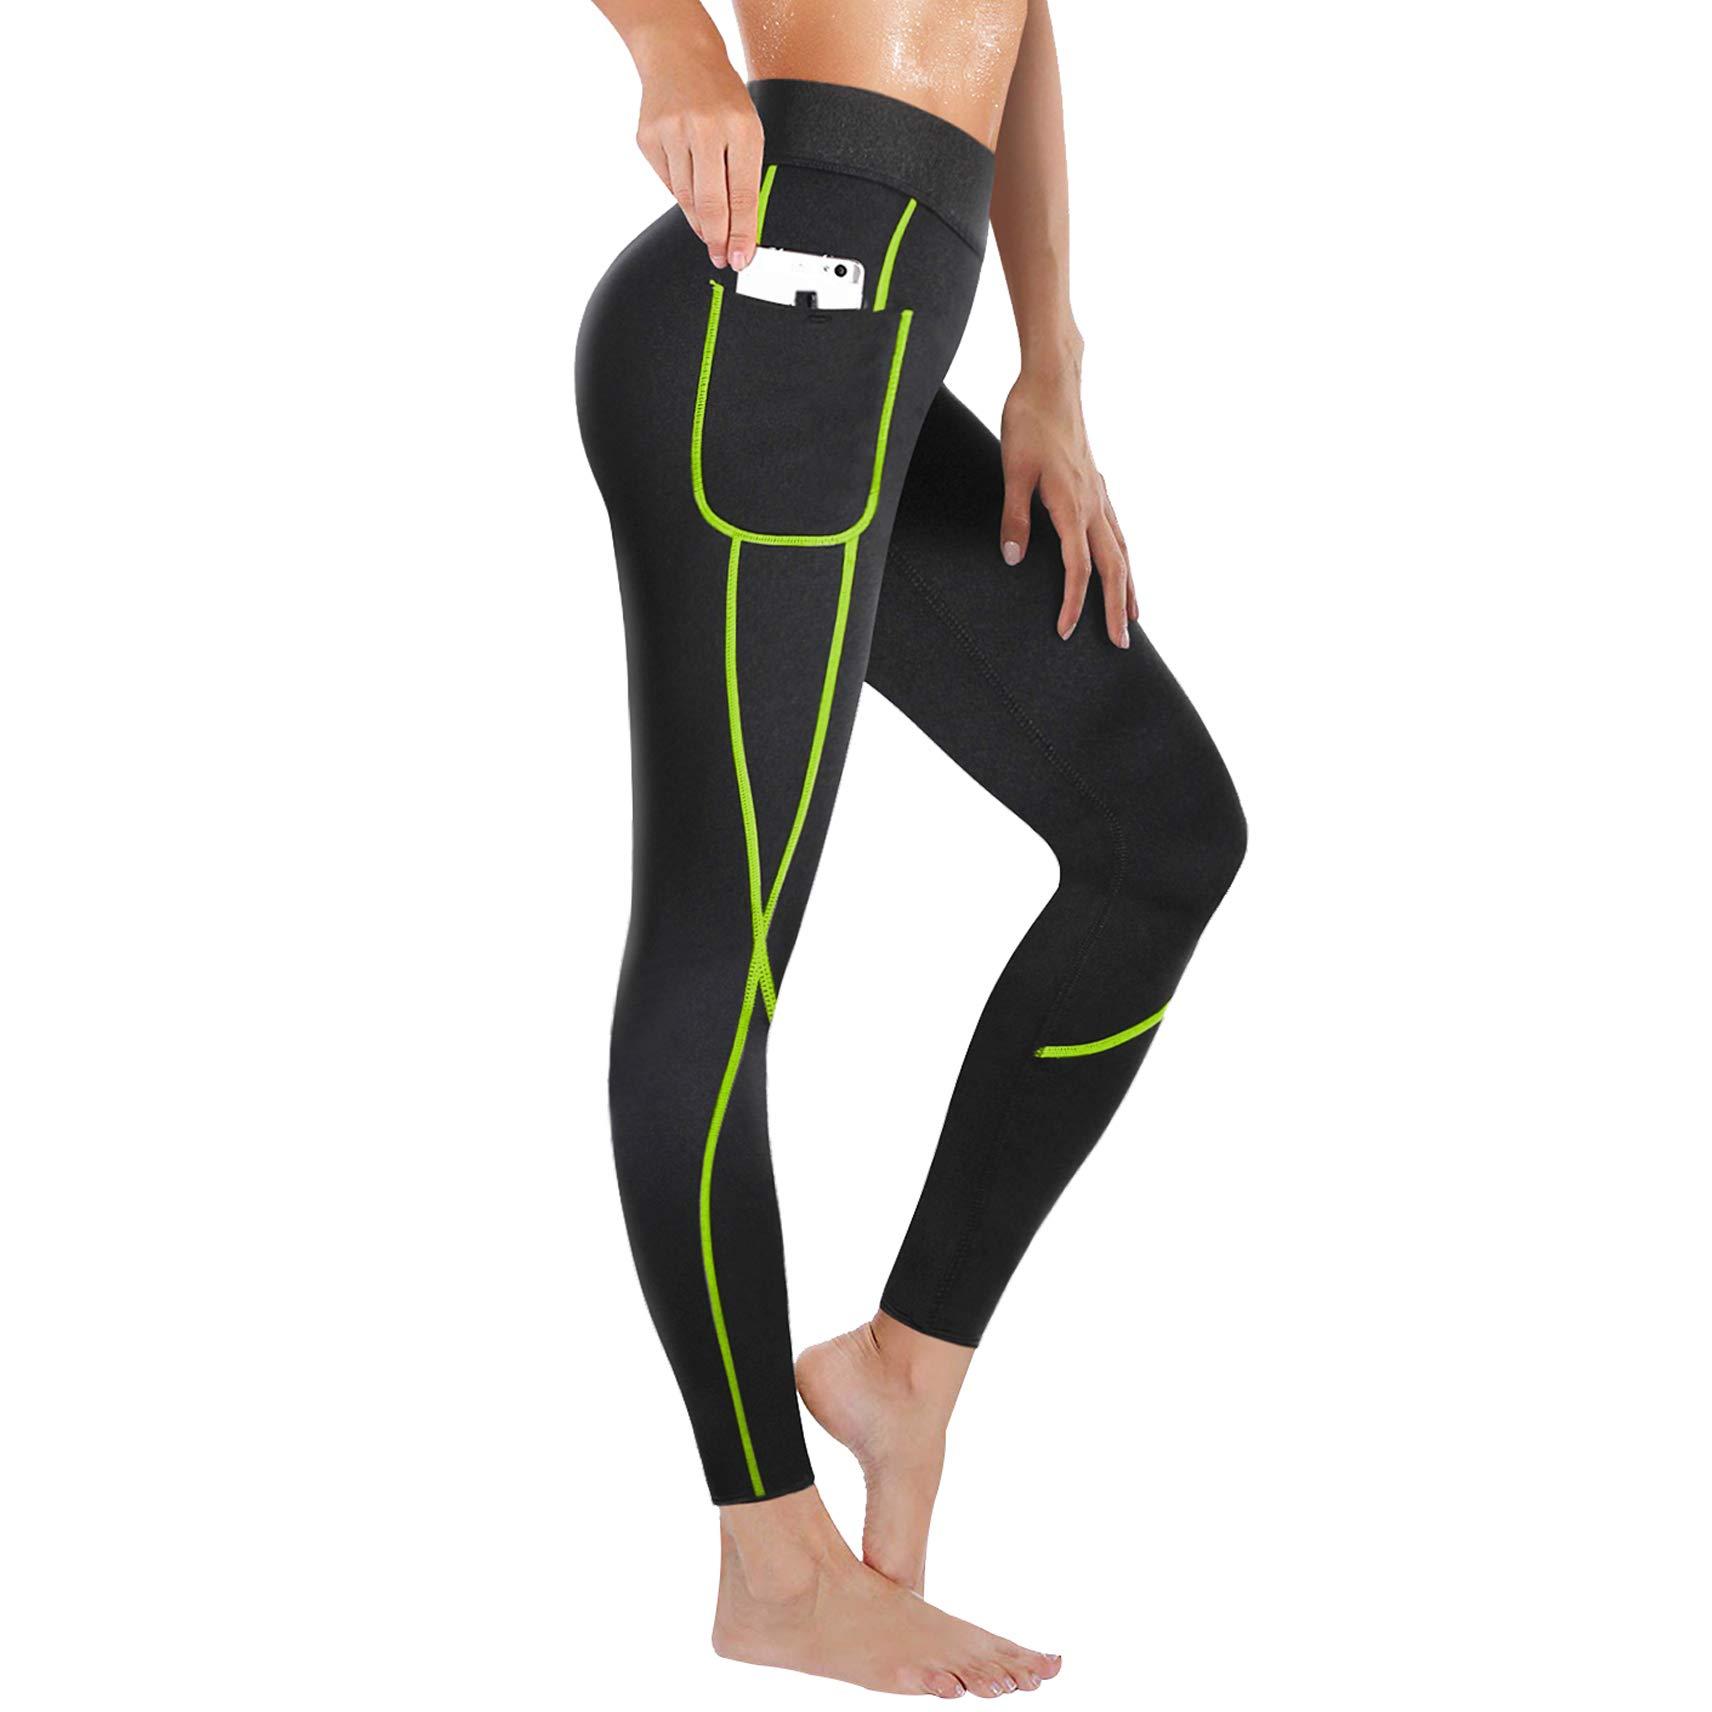 Rolewpy Women Neoprene Sauna Slimming Pants Weight Loss Hot Thermo Sweat Body Shaper Capri for Fat Burner Leggings (Green Line, Small (US 6-8))